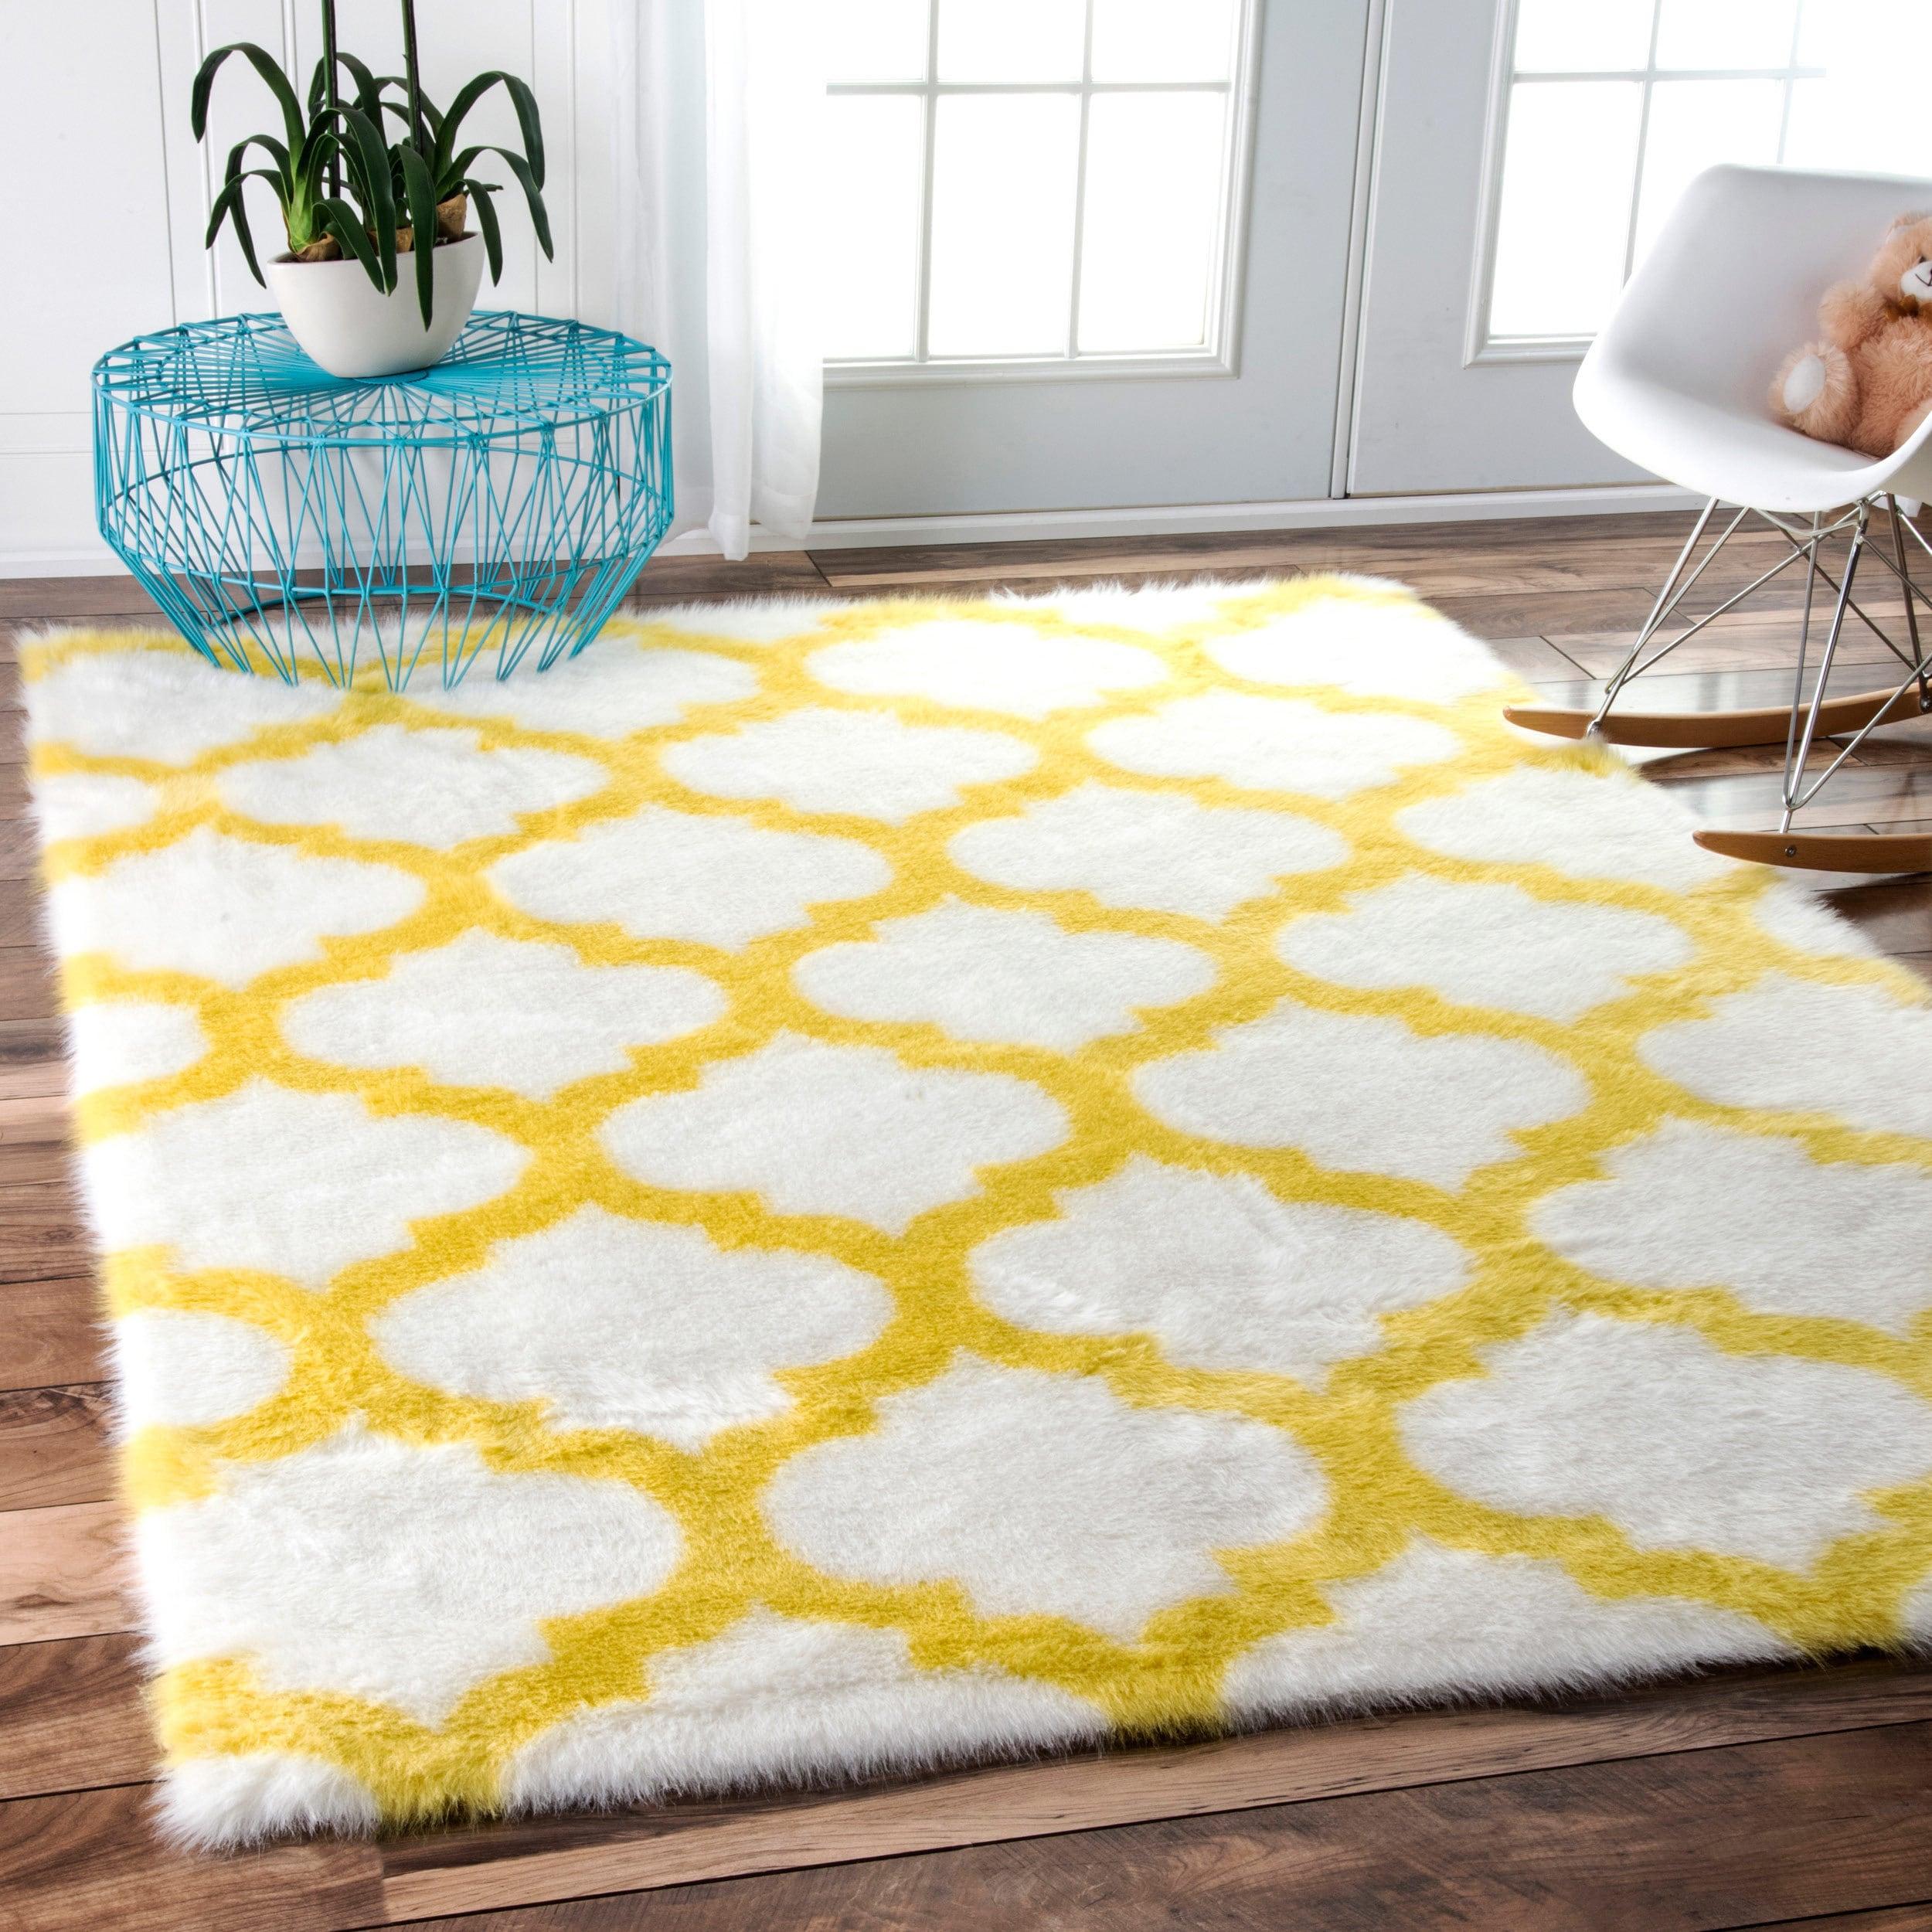 Nuloom Cozy Soft And Plush Faux Sheepskin Trellis Kids Nursery Yellow Rug 7 6 X 9 8 10 Free Shipping Today 11750533